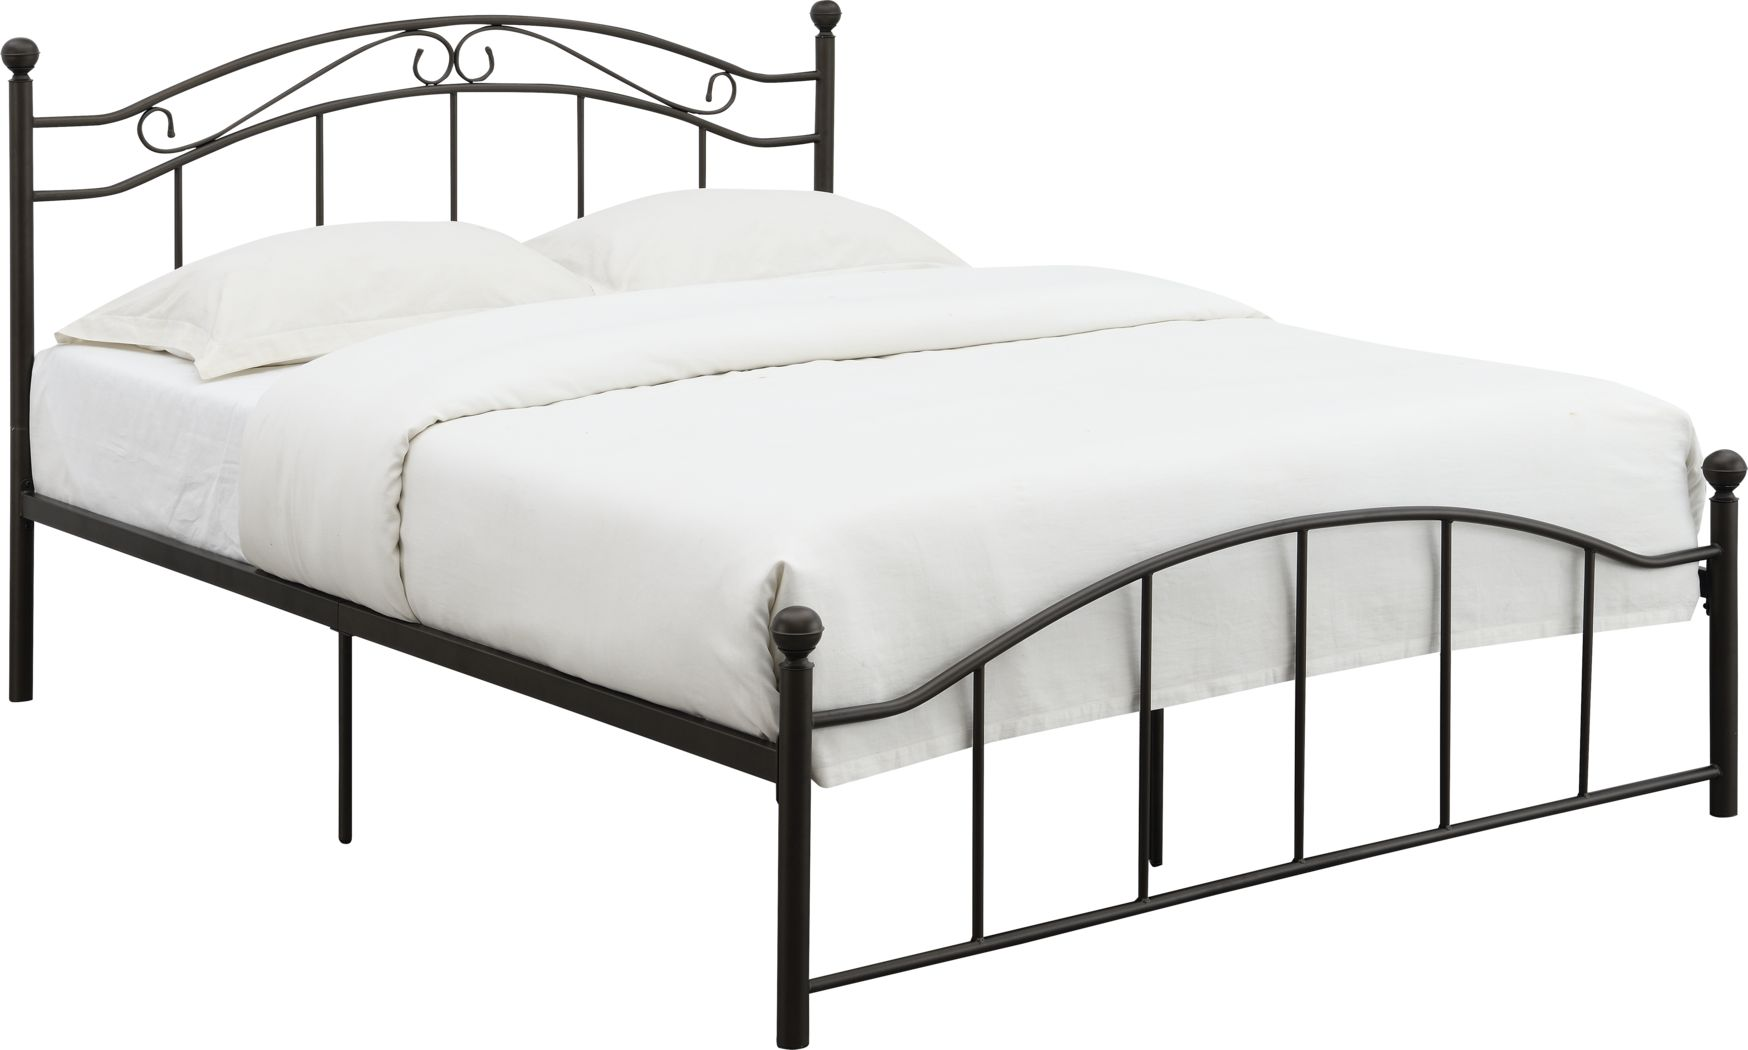 Sandyford Bronze King Bed